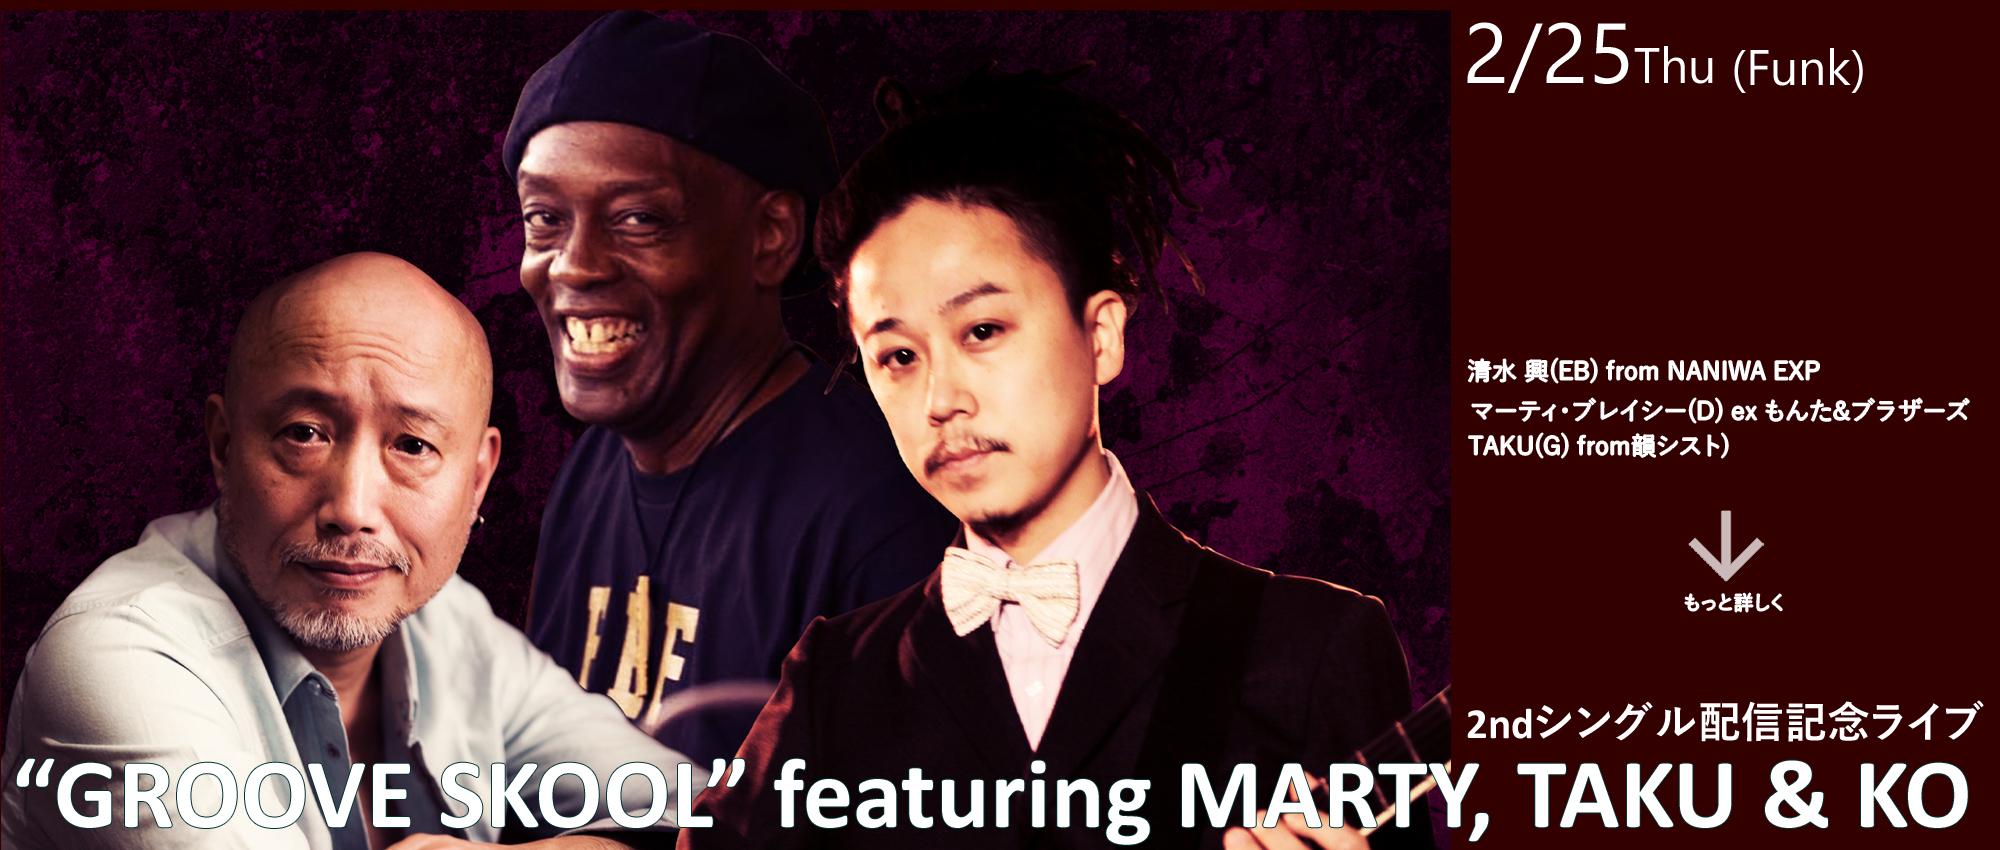 """GROOVE SKOOL"" featuring MARTY, TAKU & KO"